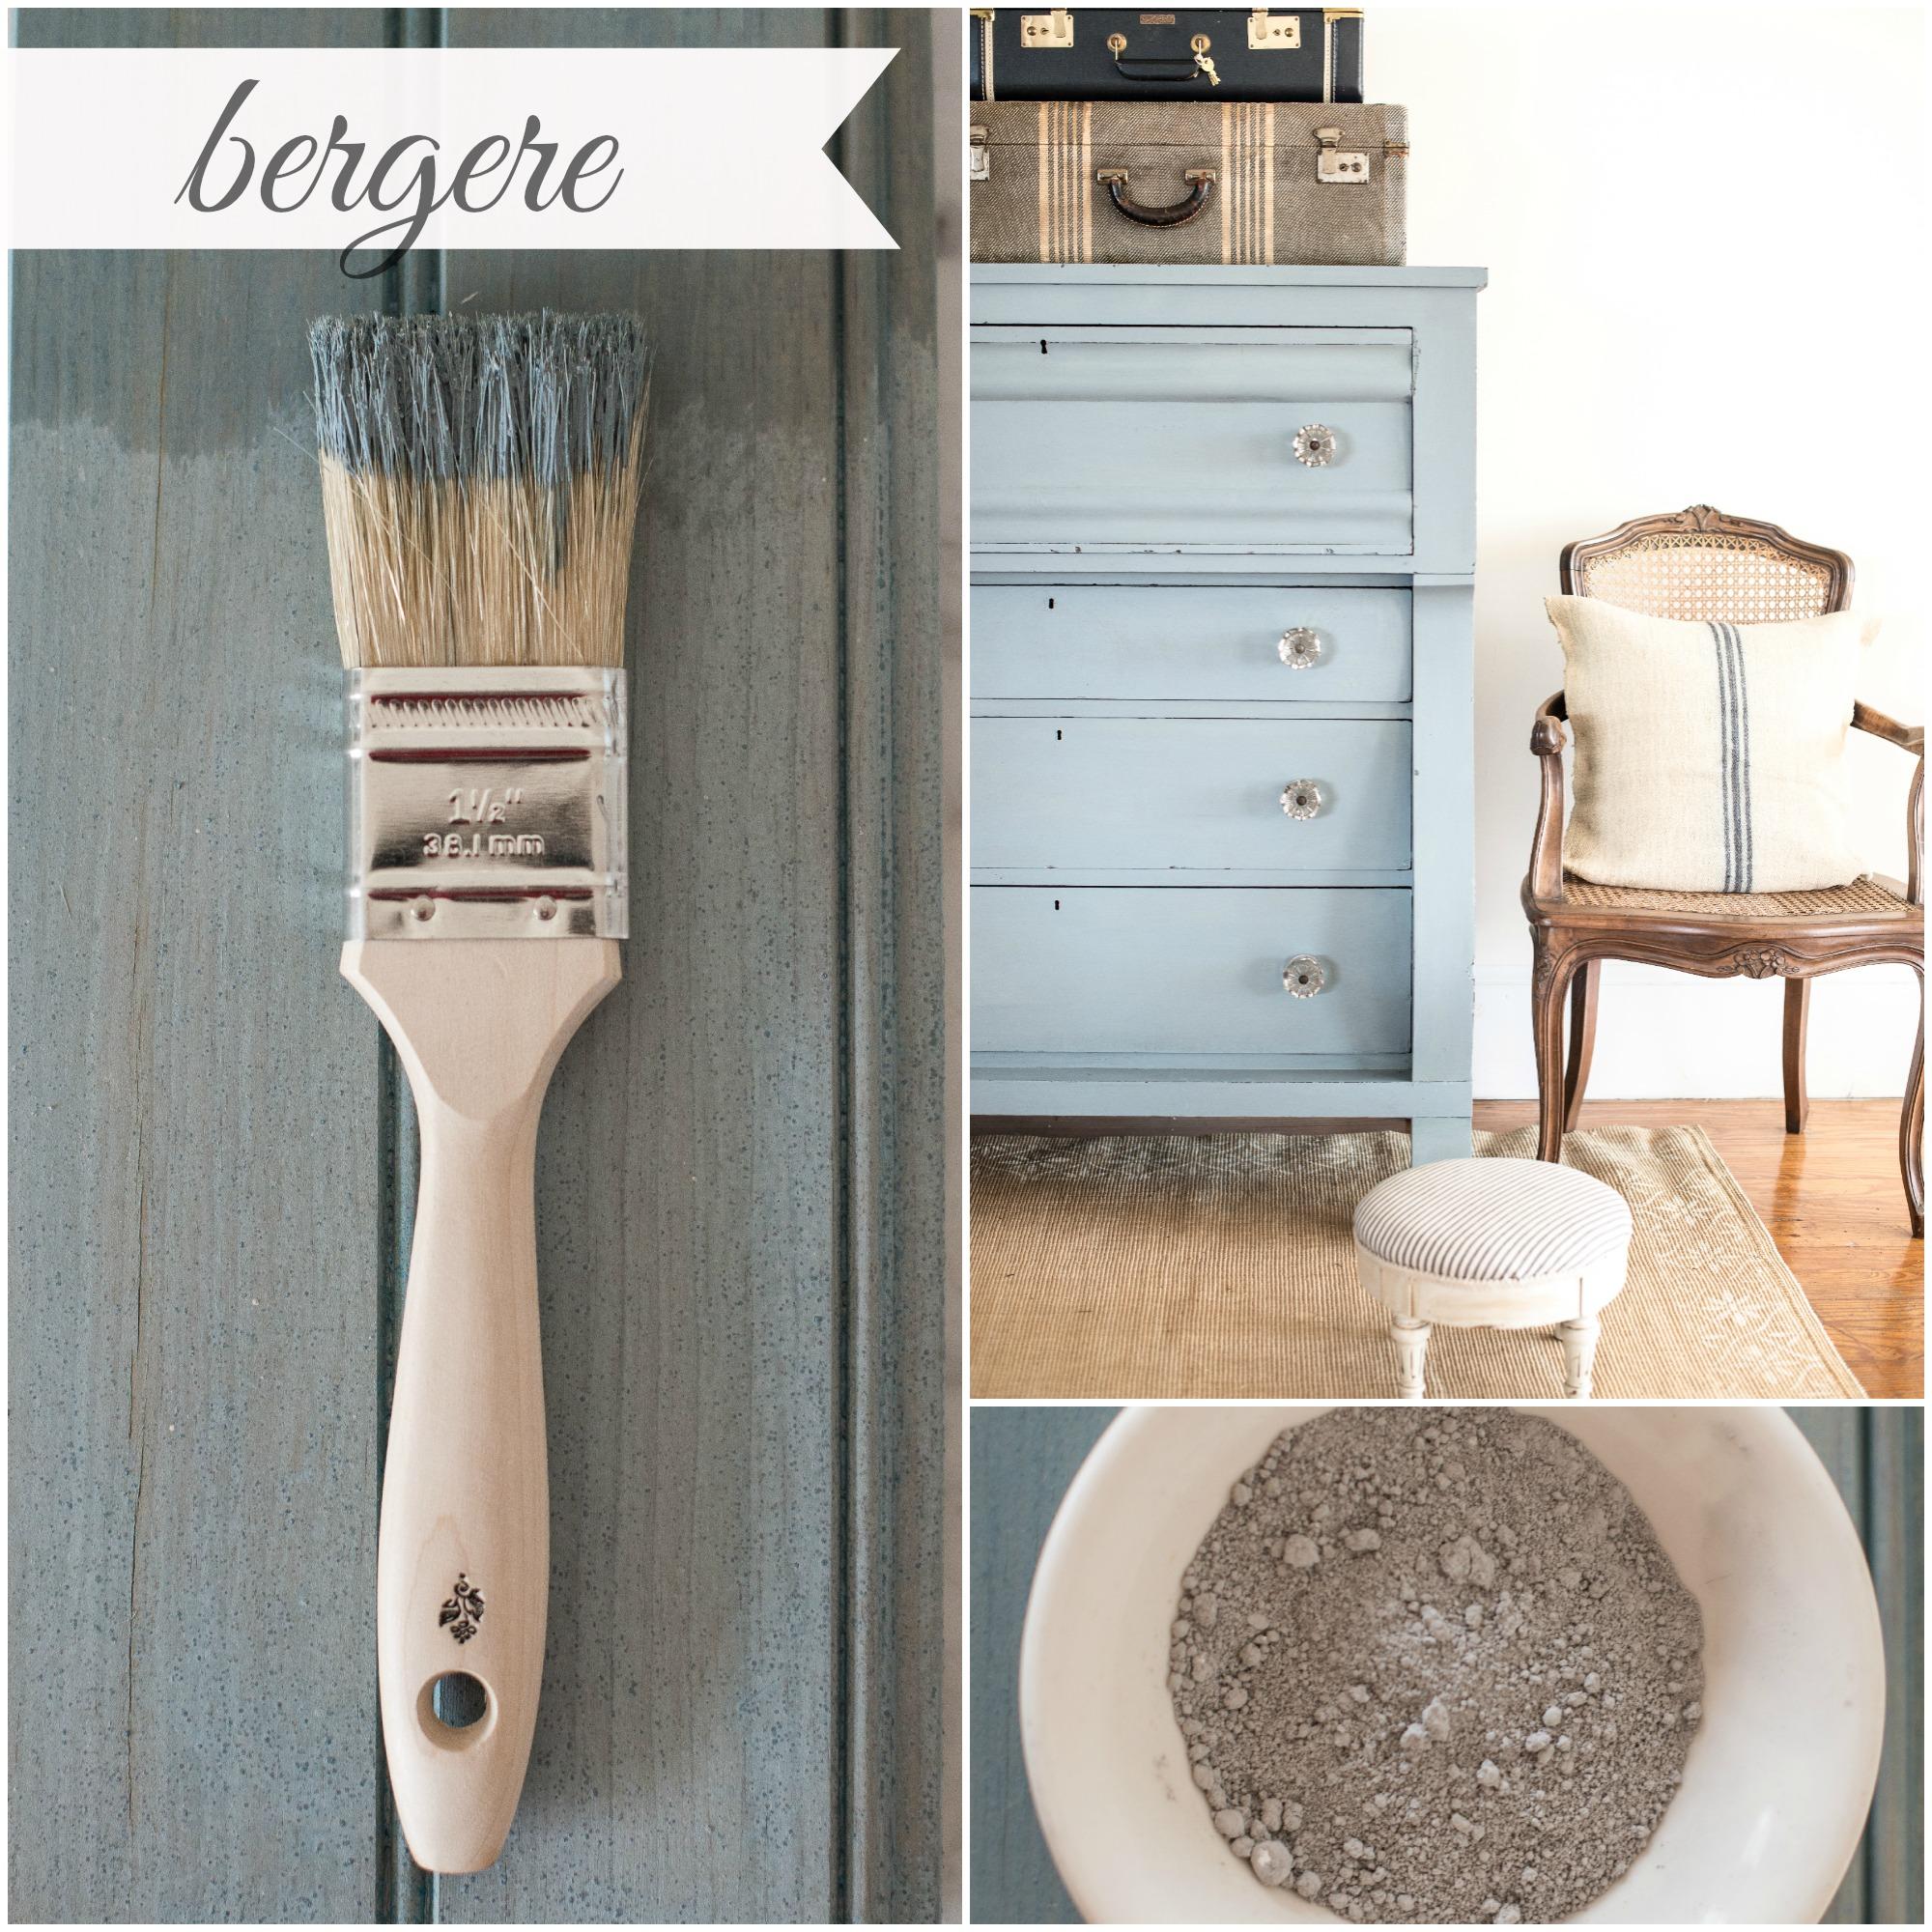 Bergere – Miss Mustard Seed\'s Milk Paint